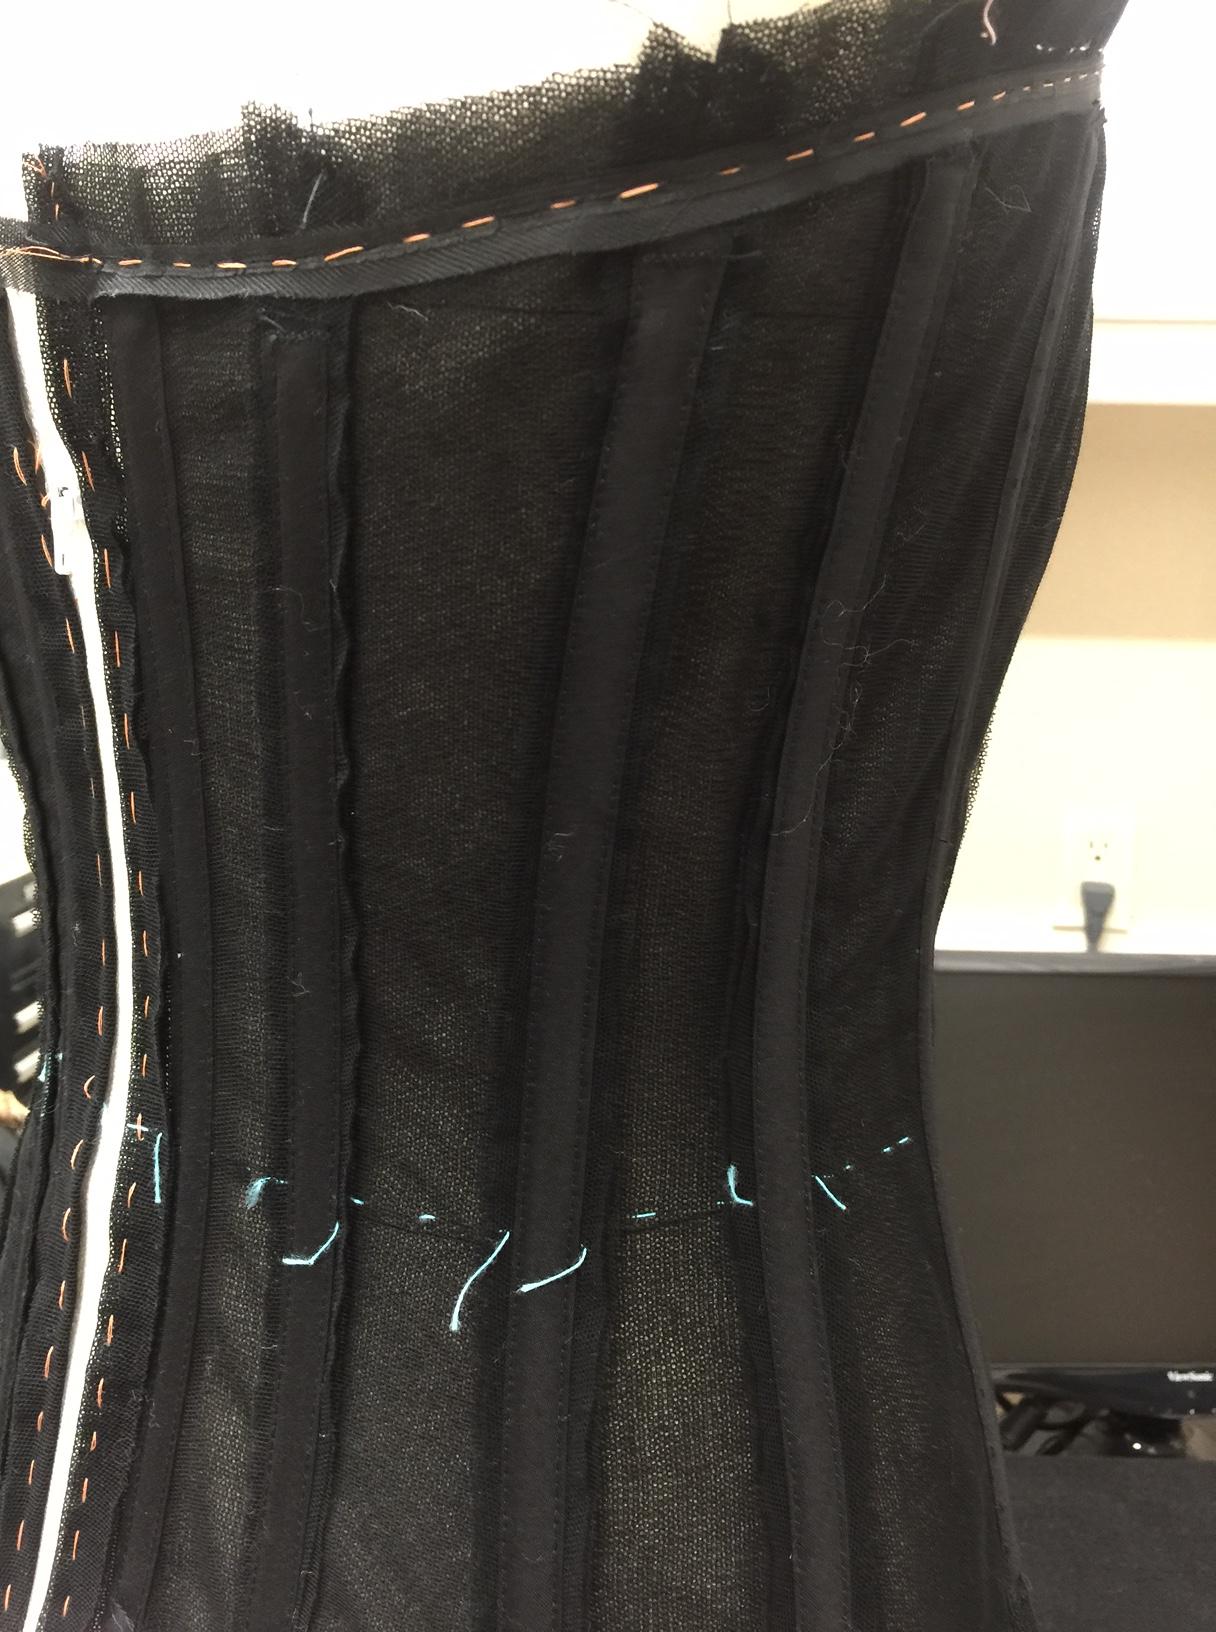 interior-corset